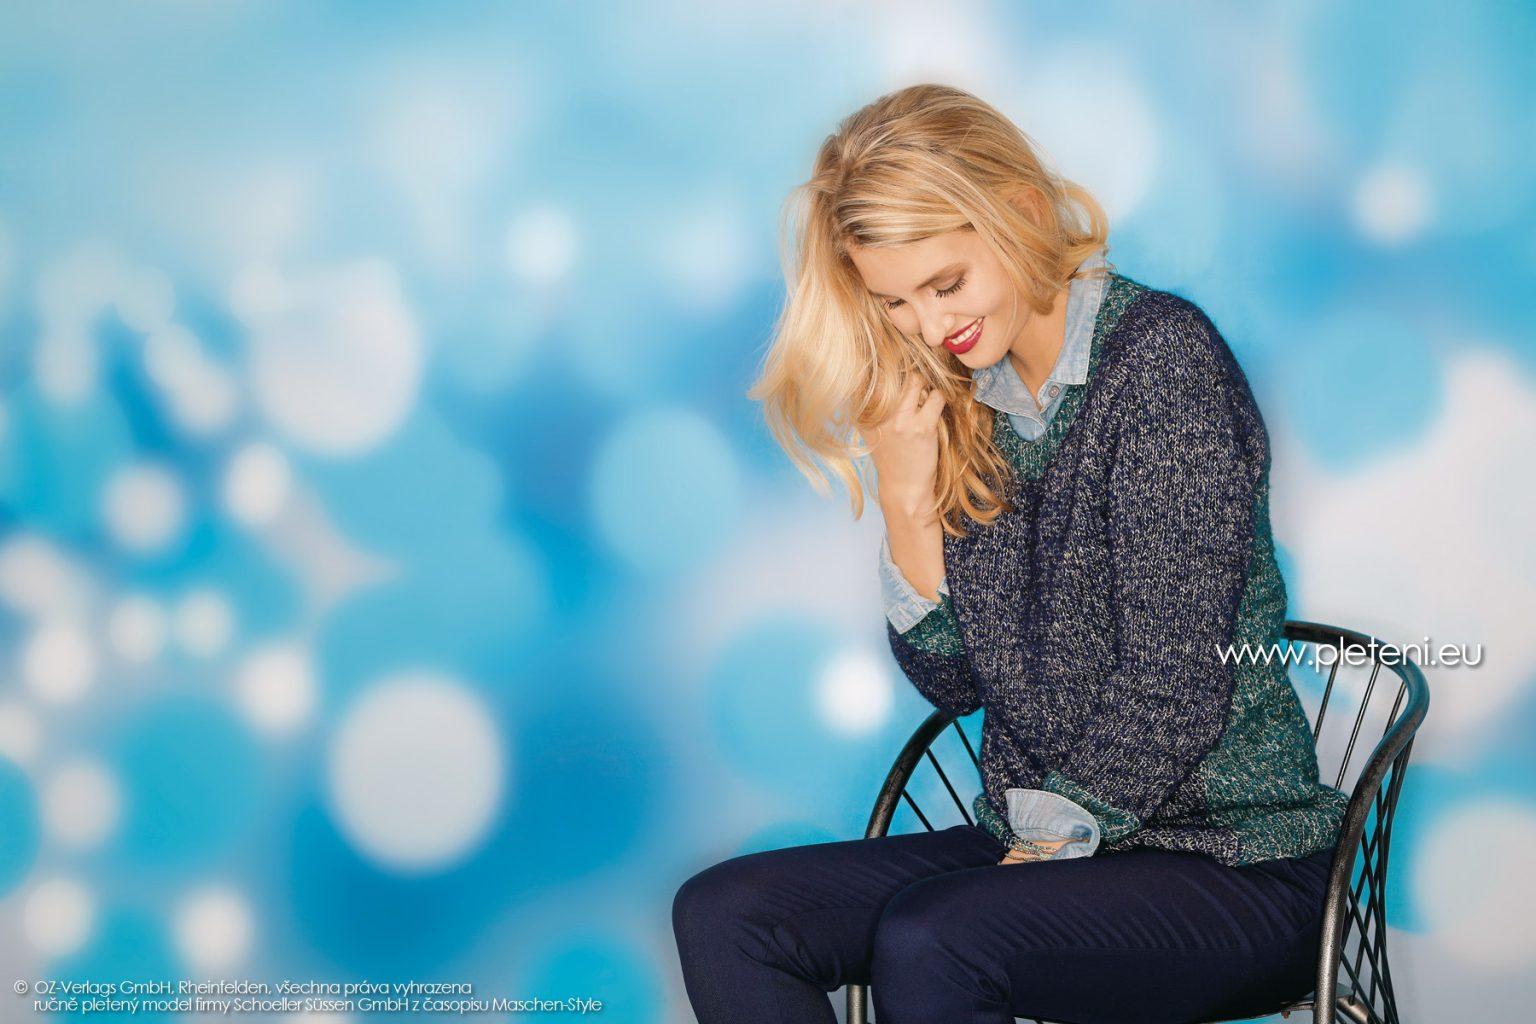 2018-Z-29 dámský pletený svetr z příze Alpaca Star nebo Mohair Dream firmy Schoeller